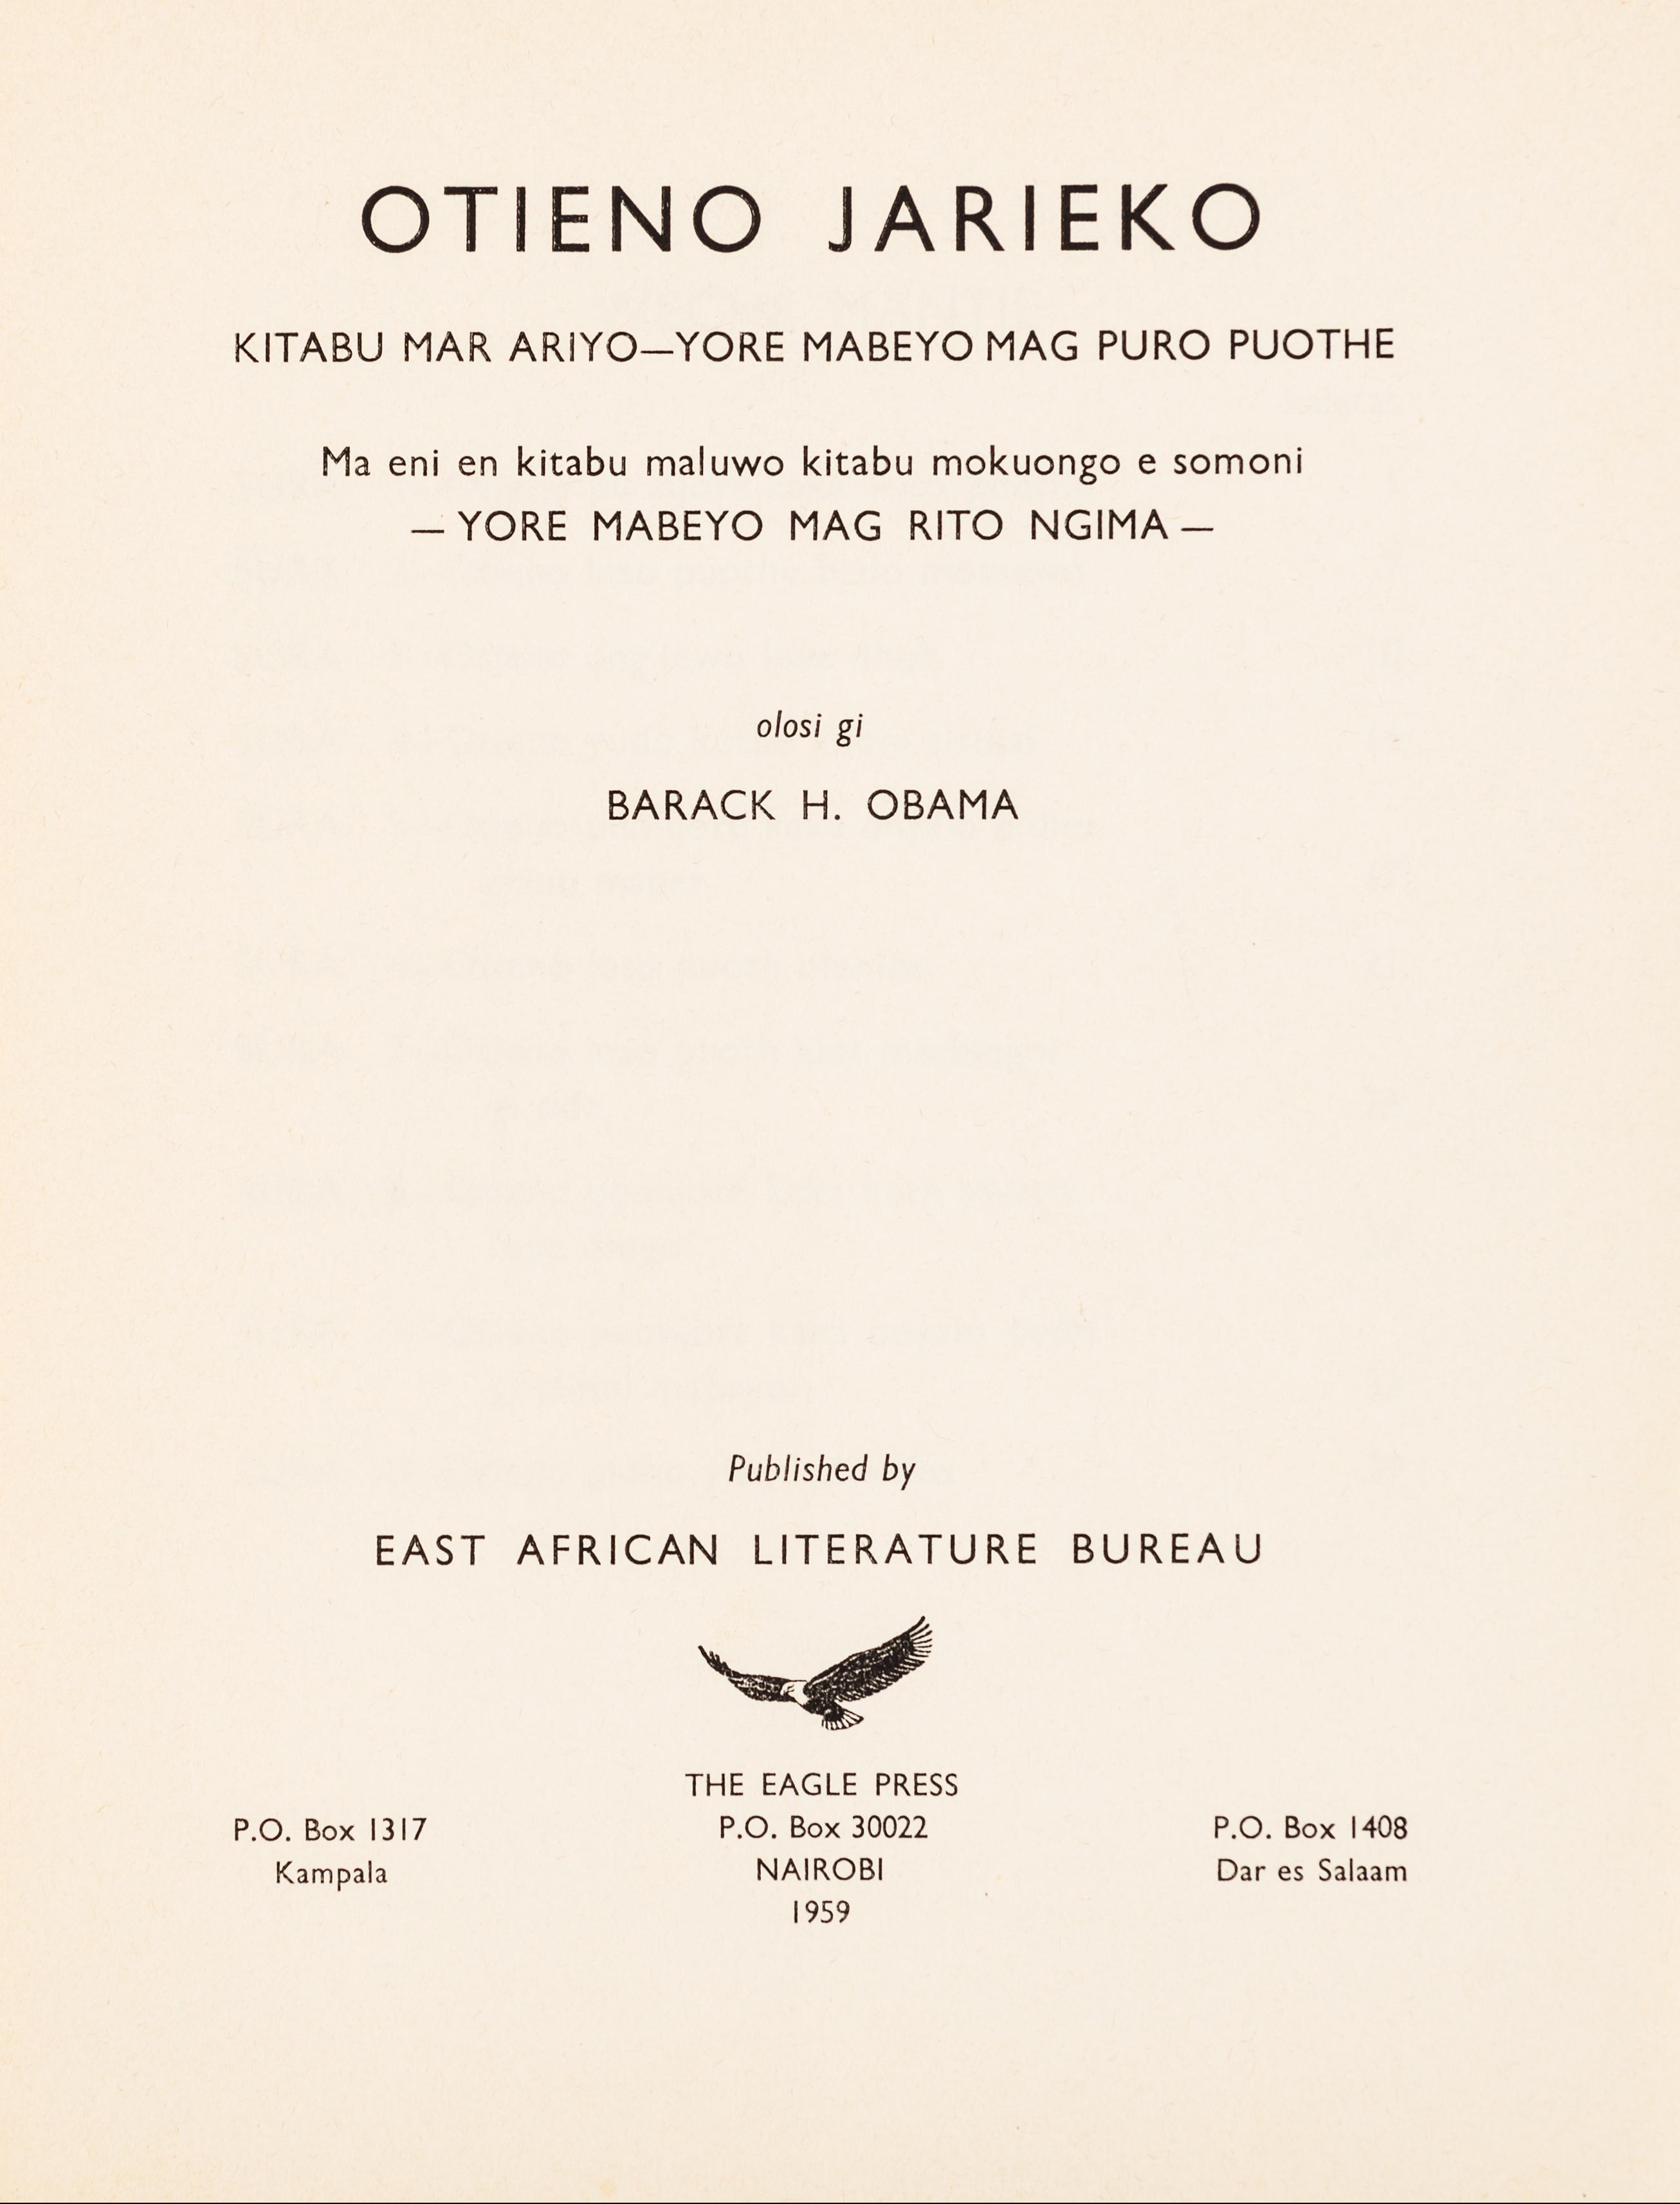 obama-titlepage.jpg